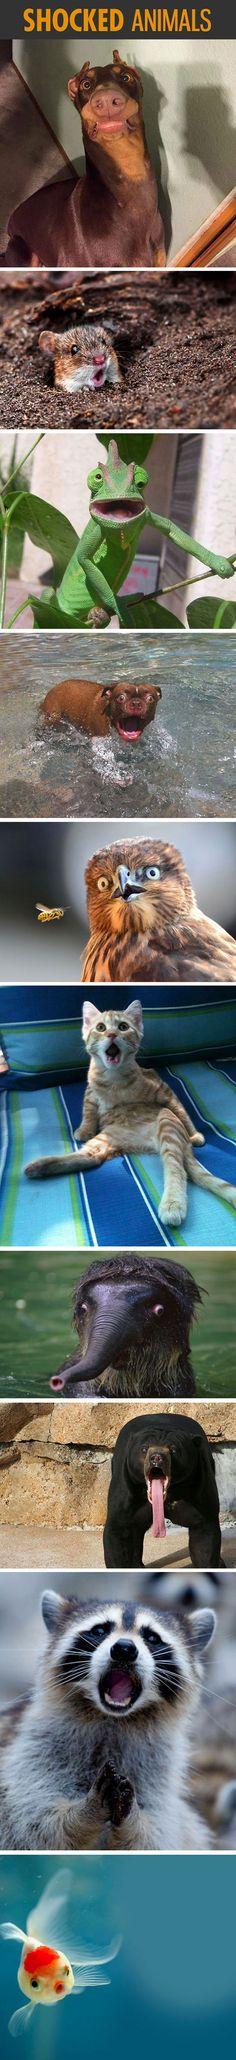 Some shocked animals...